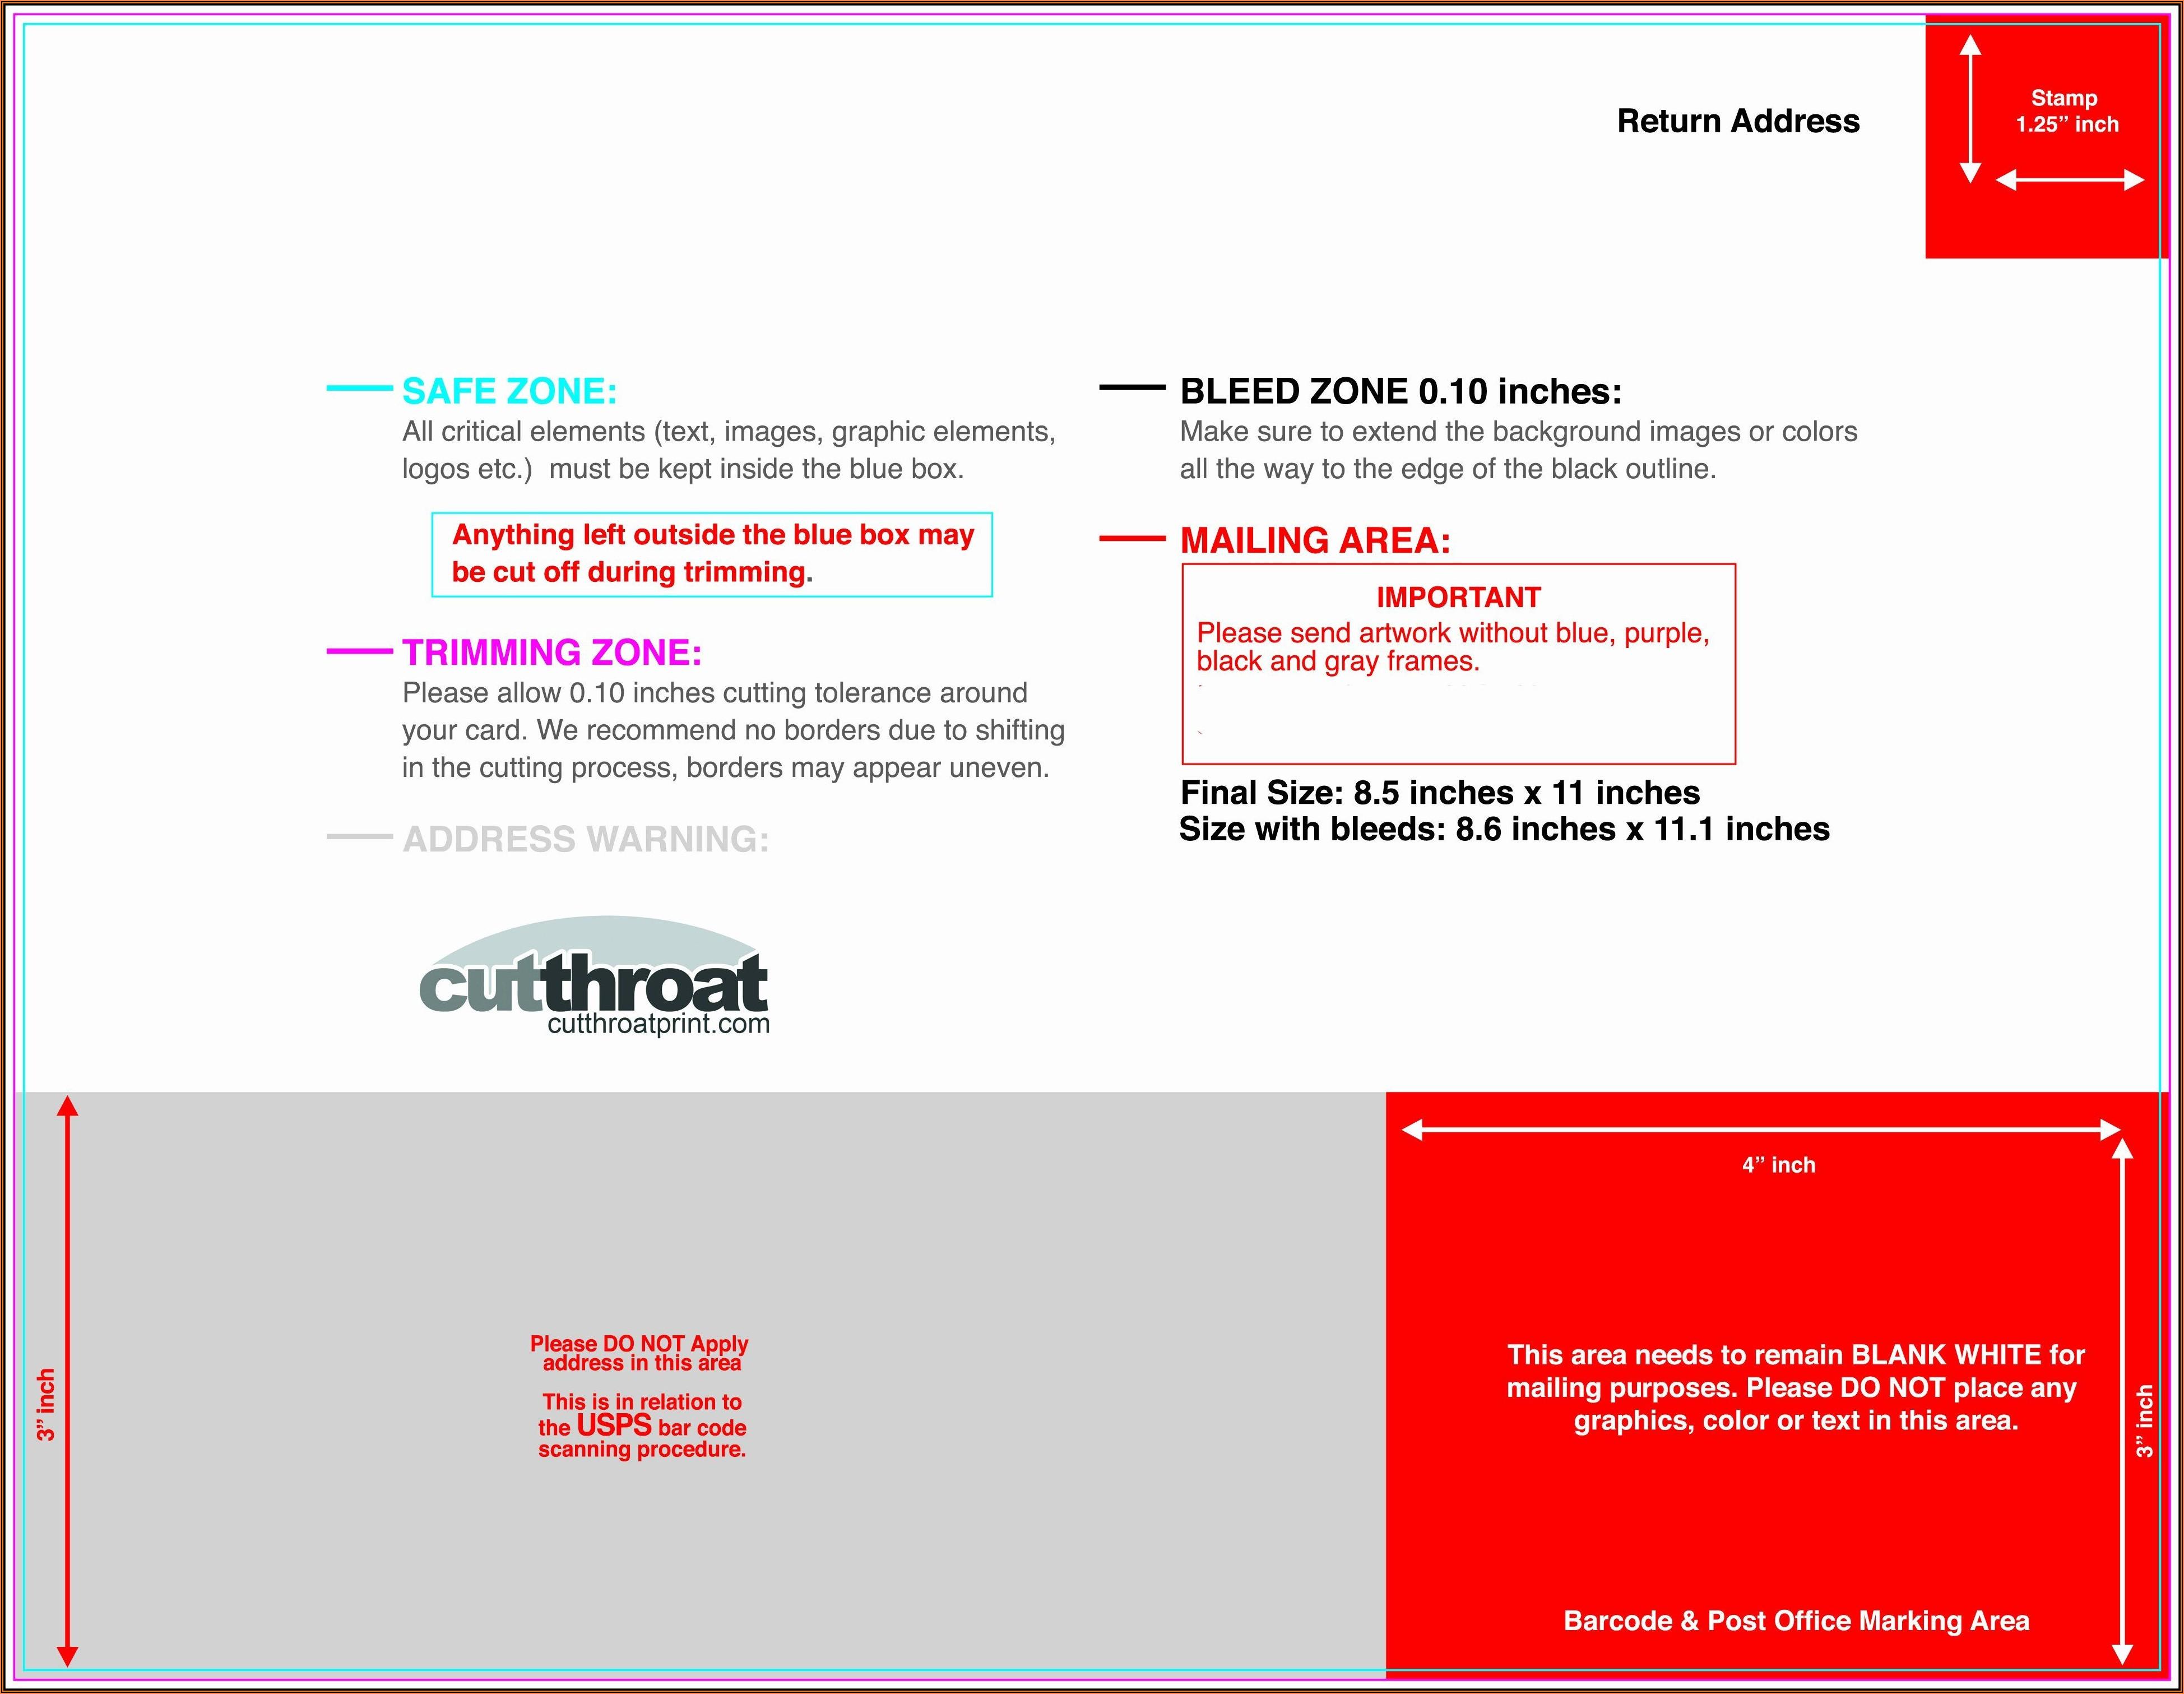 8.5 X 11 Postcard Template